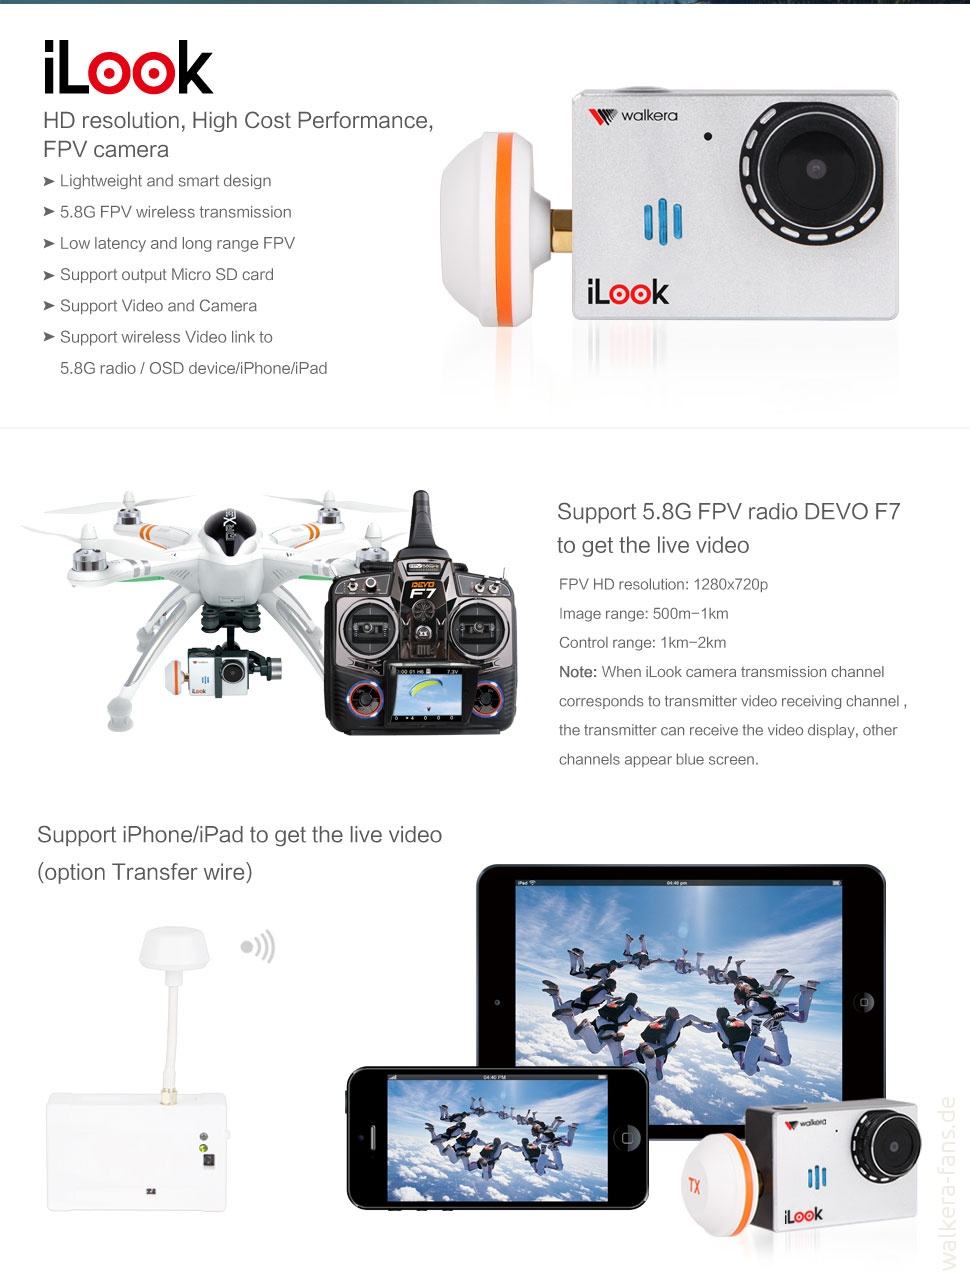 iLook Kamera: Spezifikationen und Innenleben – Walkera Fans on